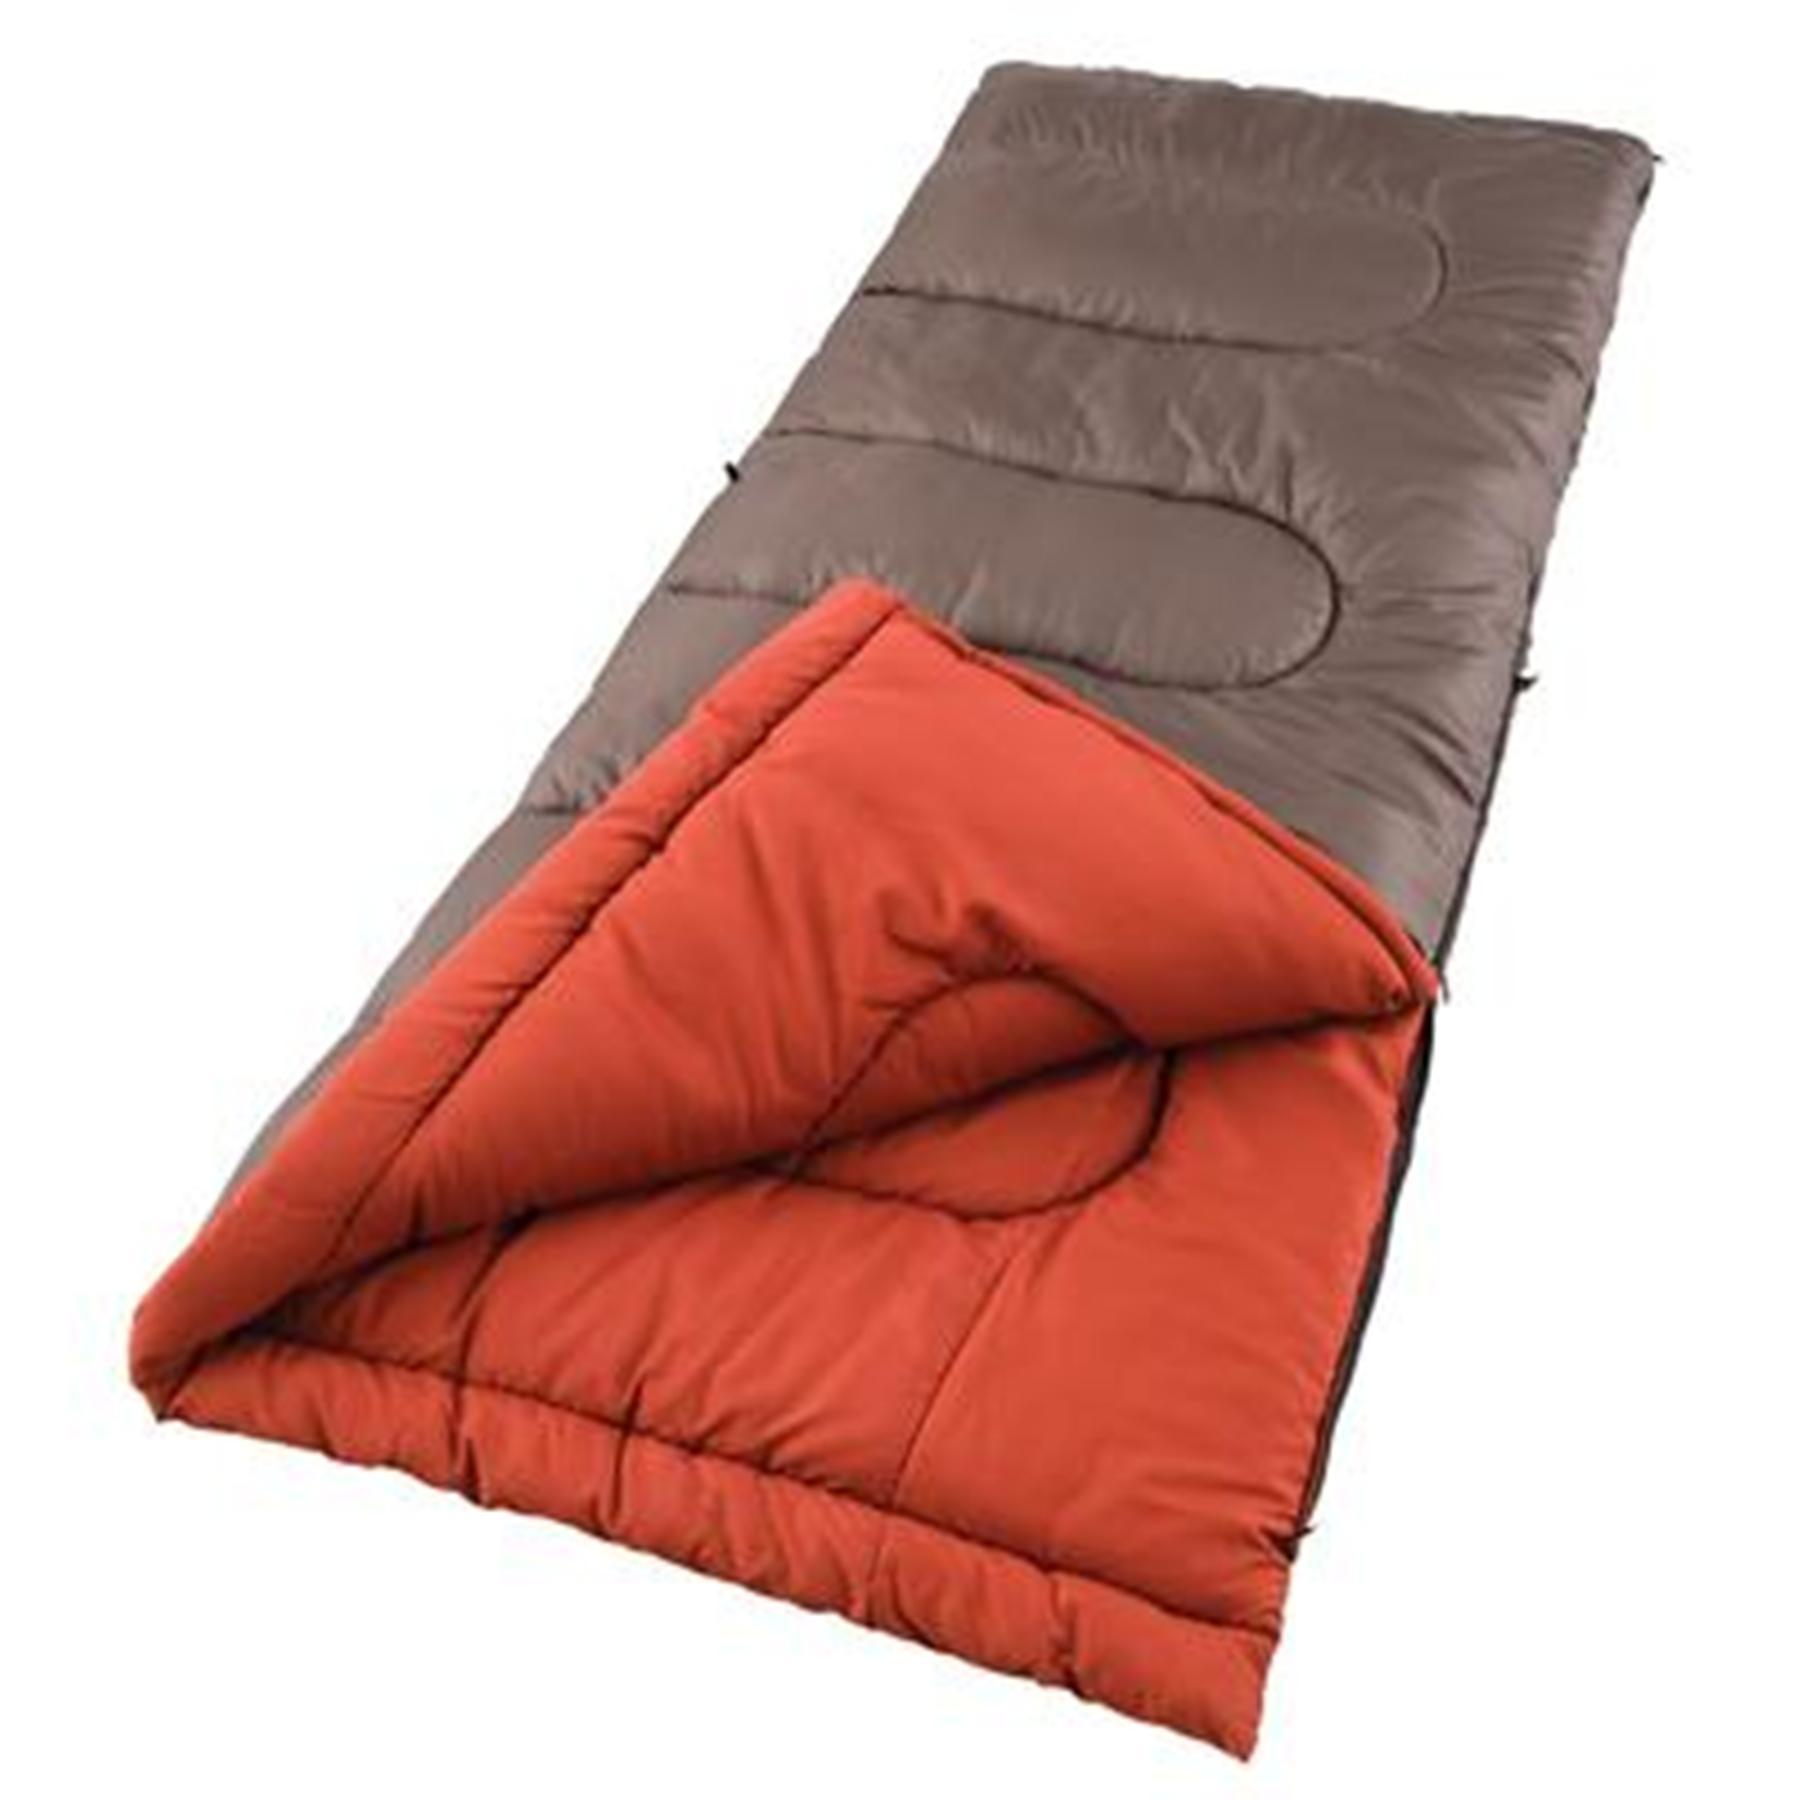 Coleman Sunset Falls Sleeping Bag - Brown